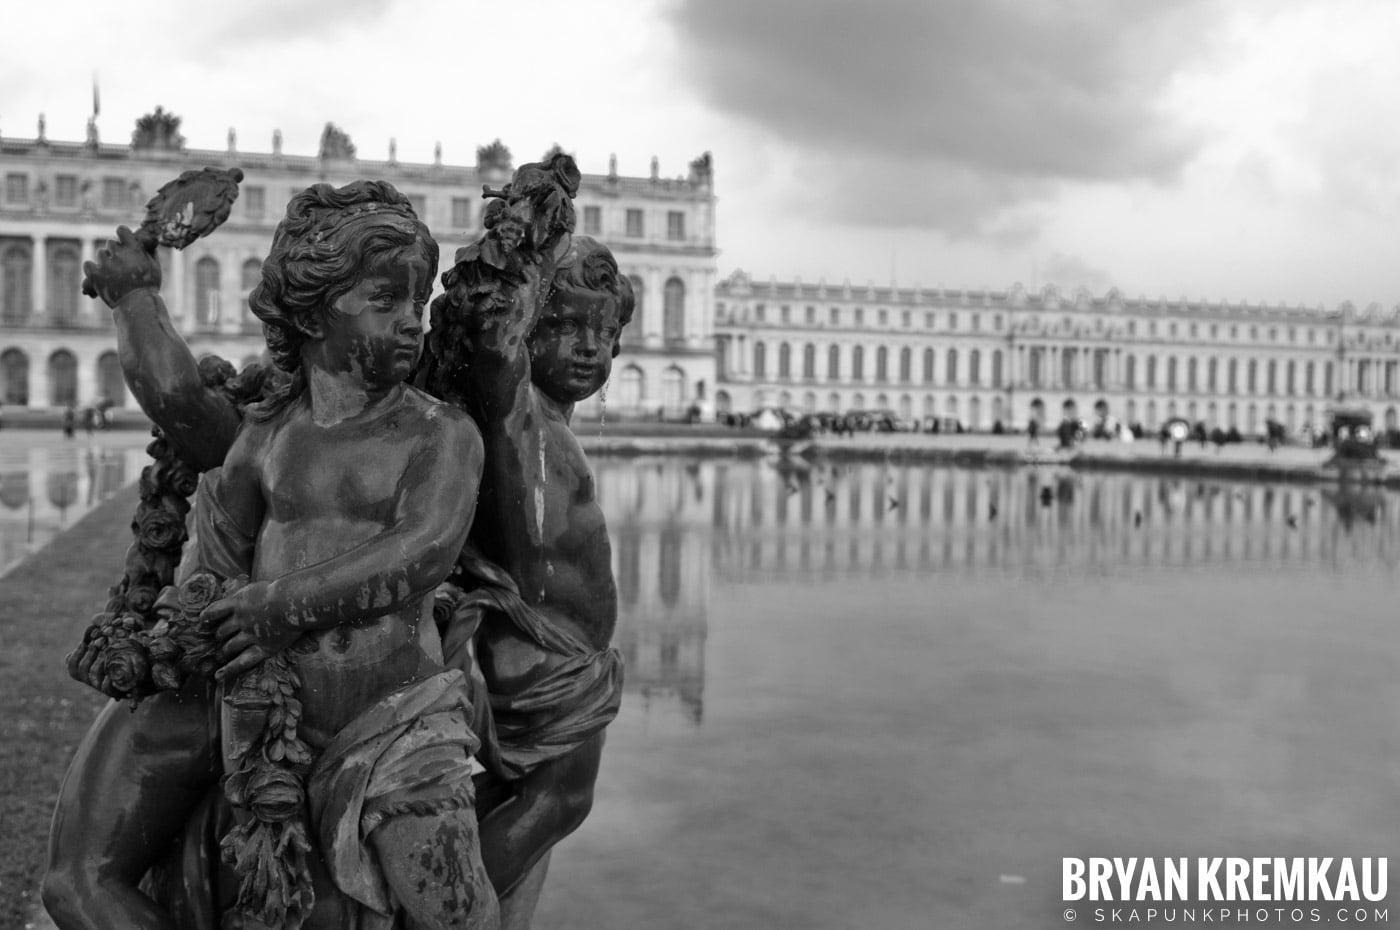 Paris, France Honeymoon - Day 2 - 7.19.11 (9)